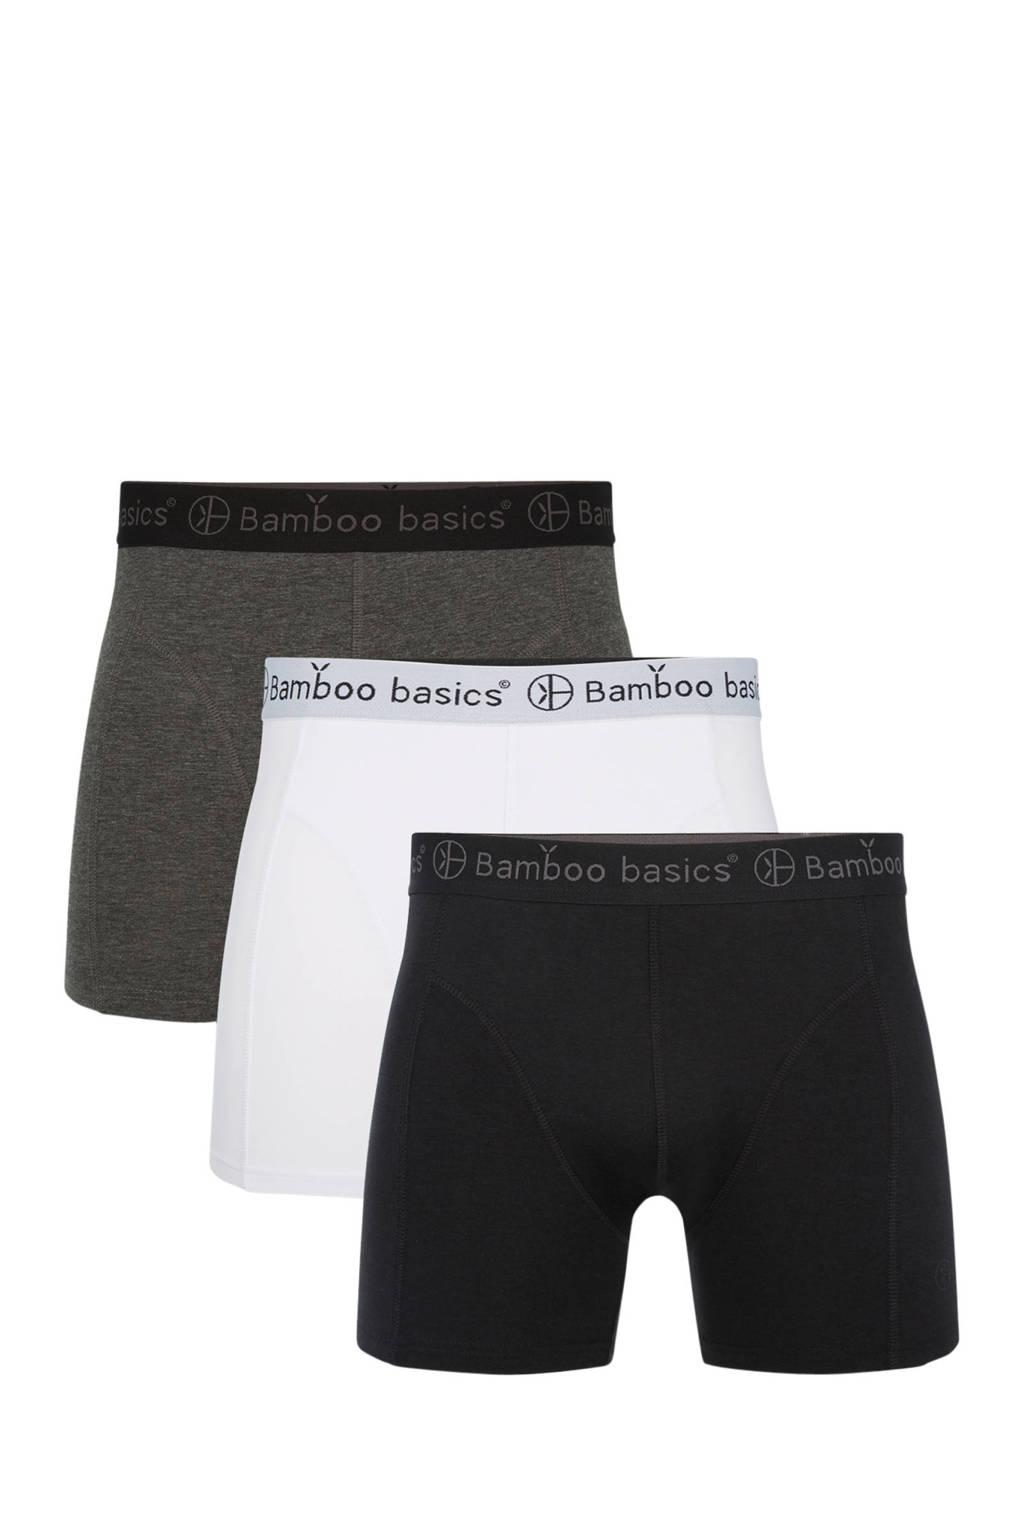 30fb348984a Bamboo Basics boxershort Rico met bamboe (set van 3), Grijs/wit/